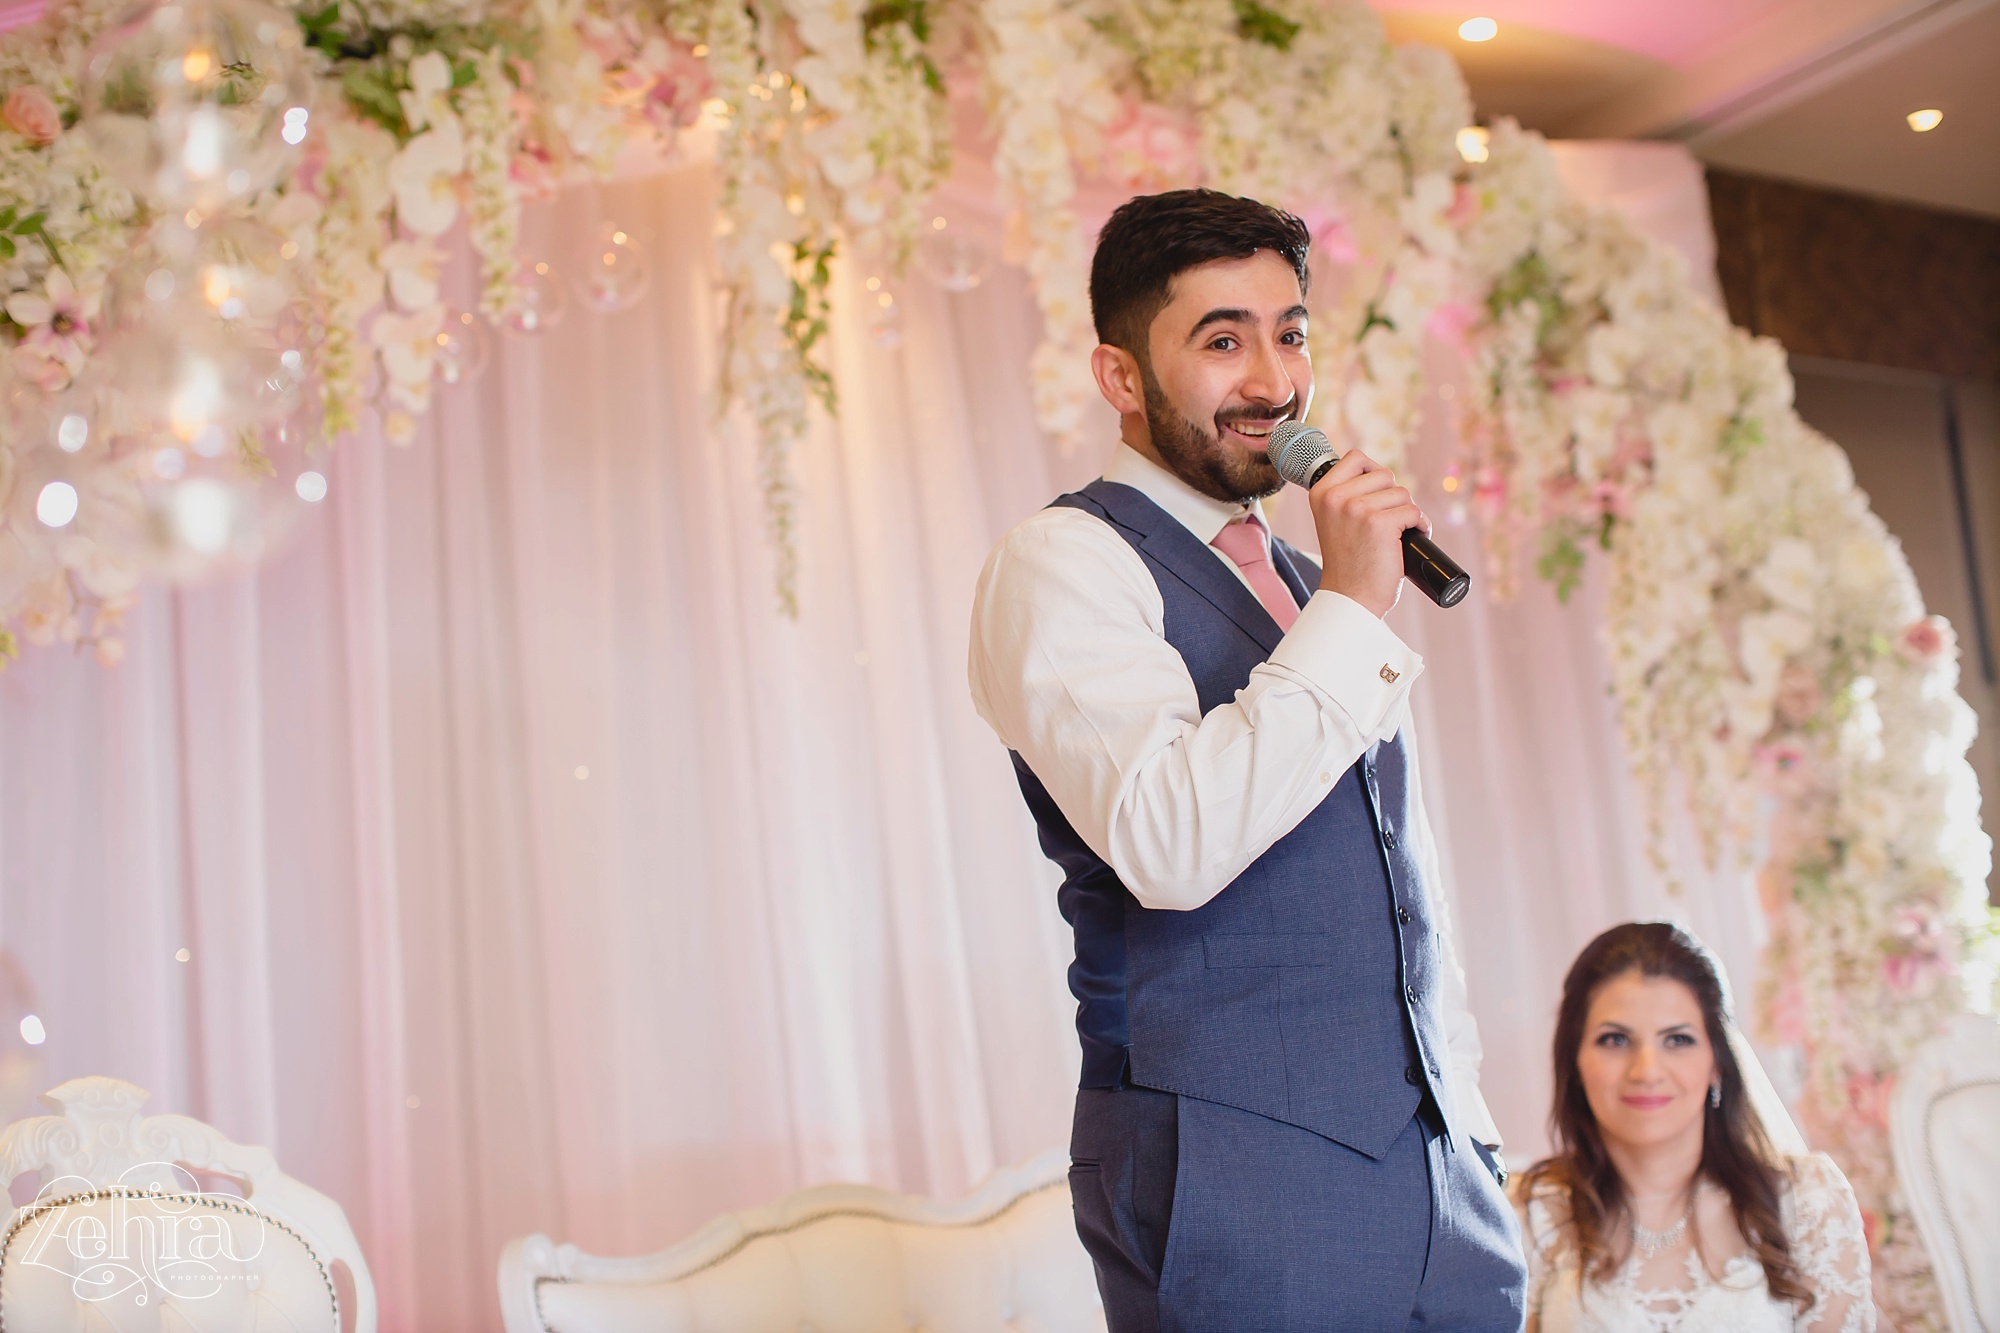 zehra photographer mere cheshire wedding_0056.jpg